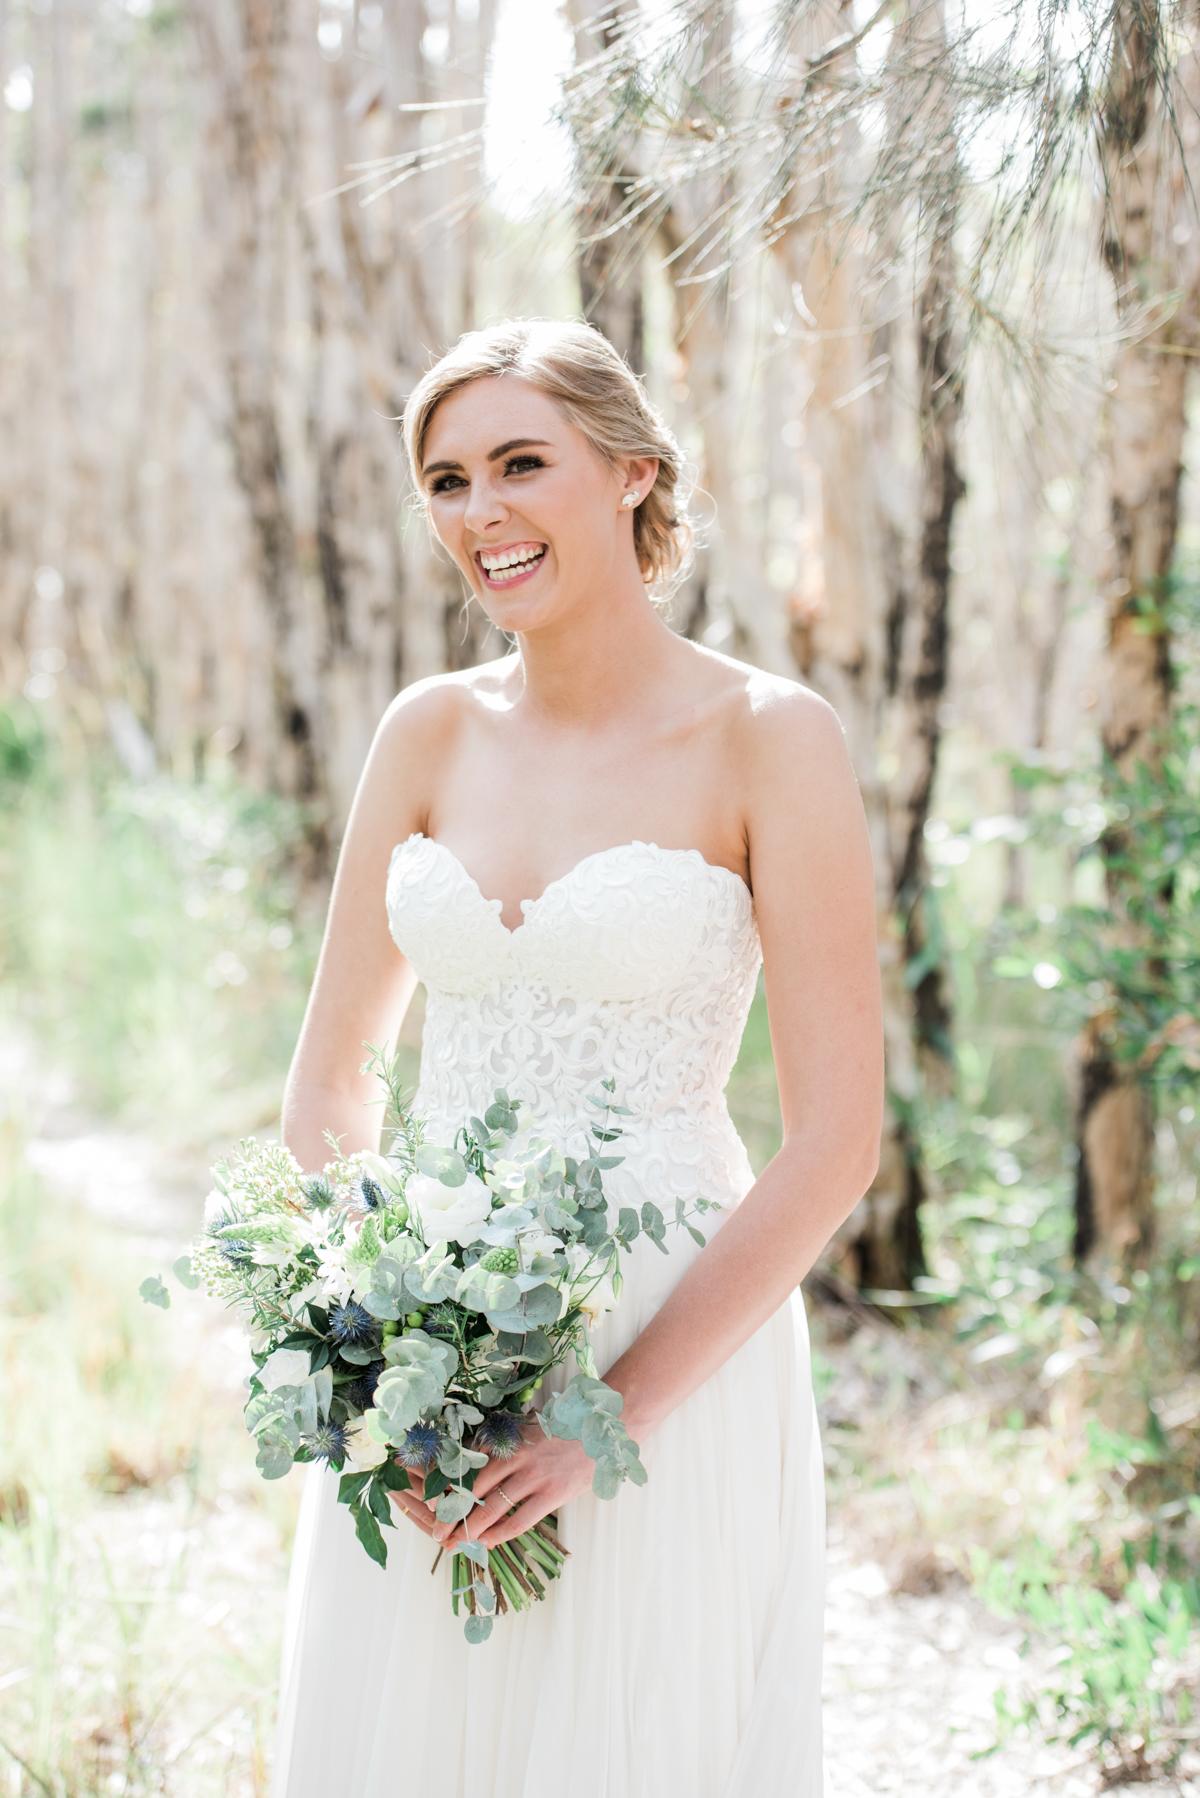 Cass and Josh- wedding photographer, byron bay wedding and family photographer, tweed heads wedding and family photography-461.jpg